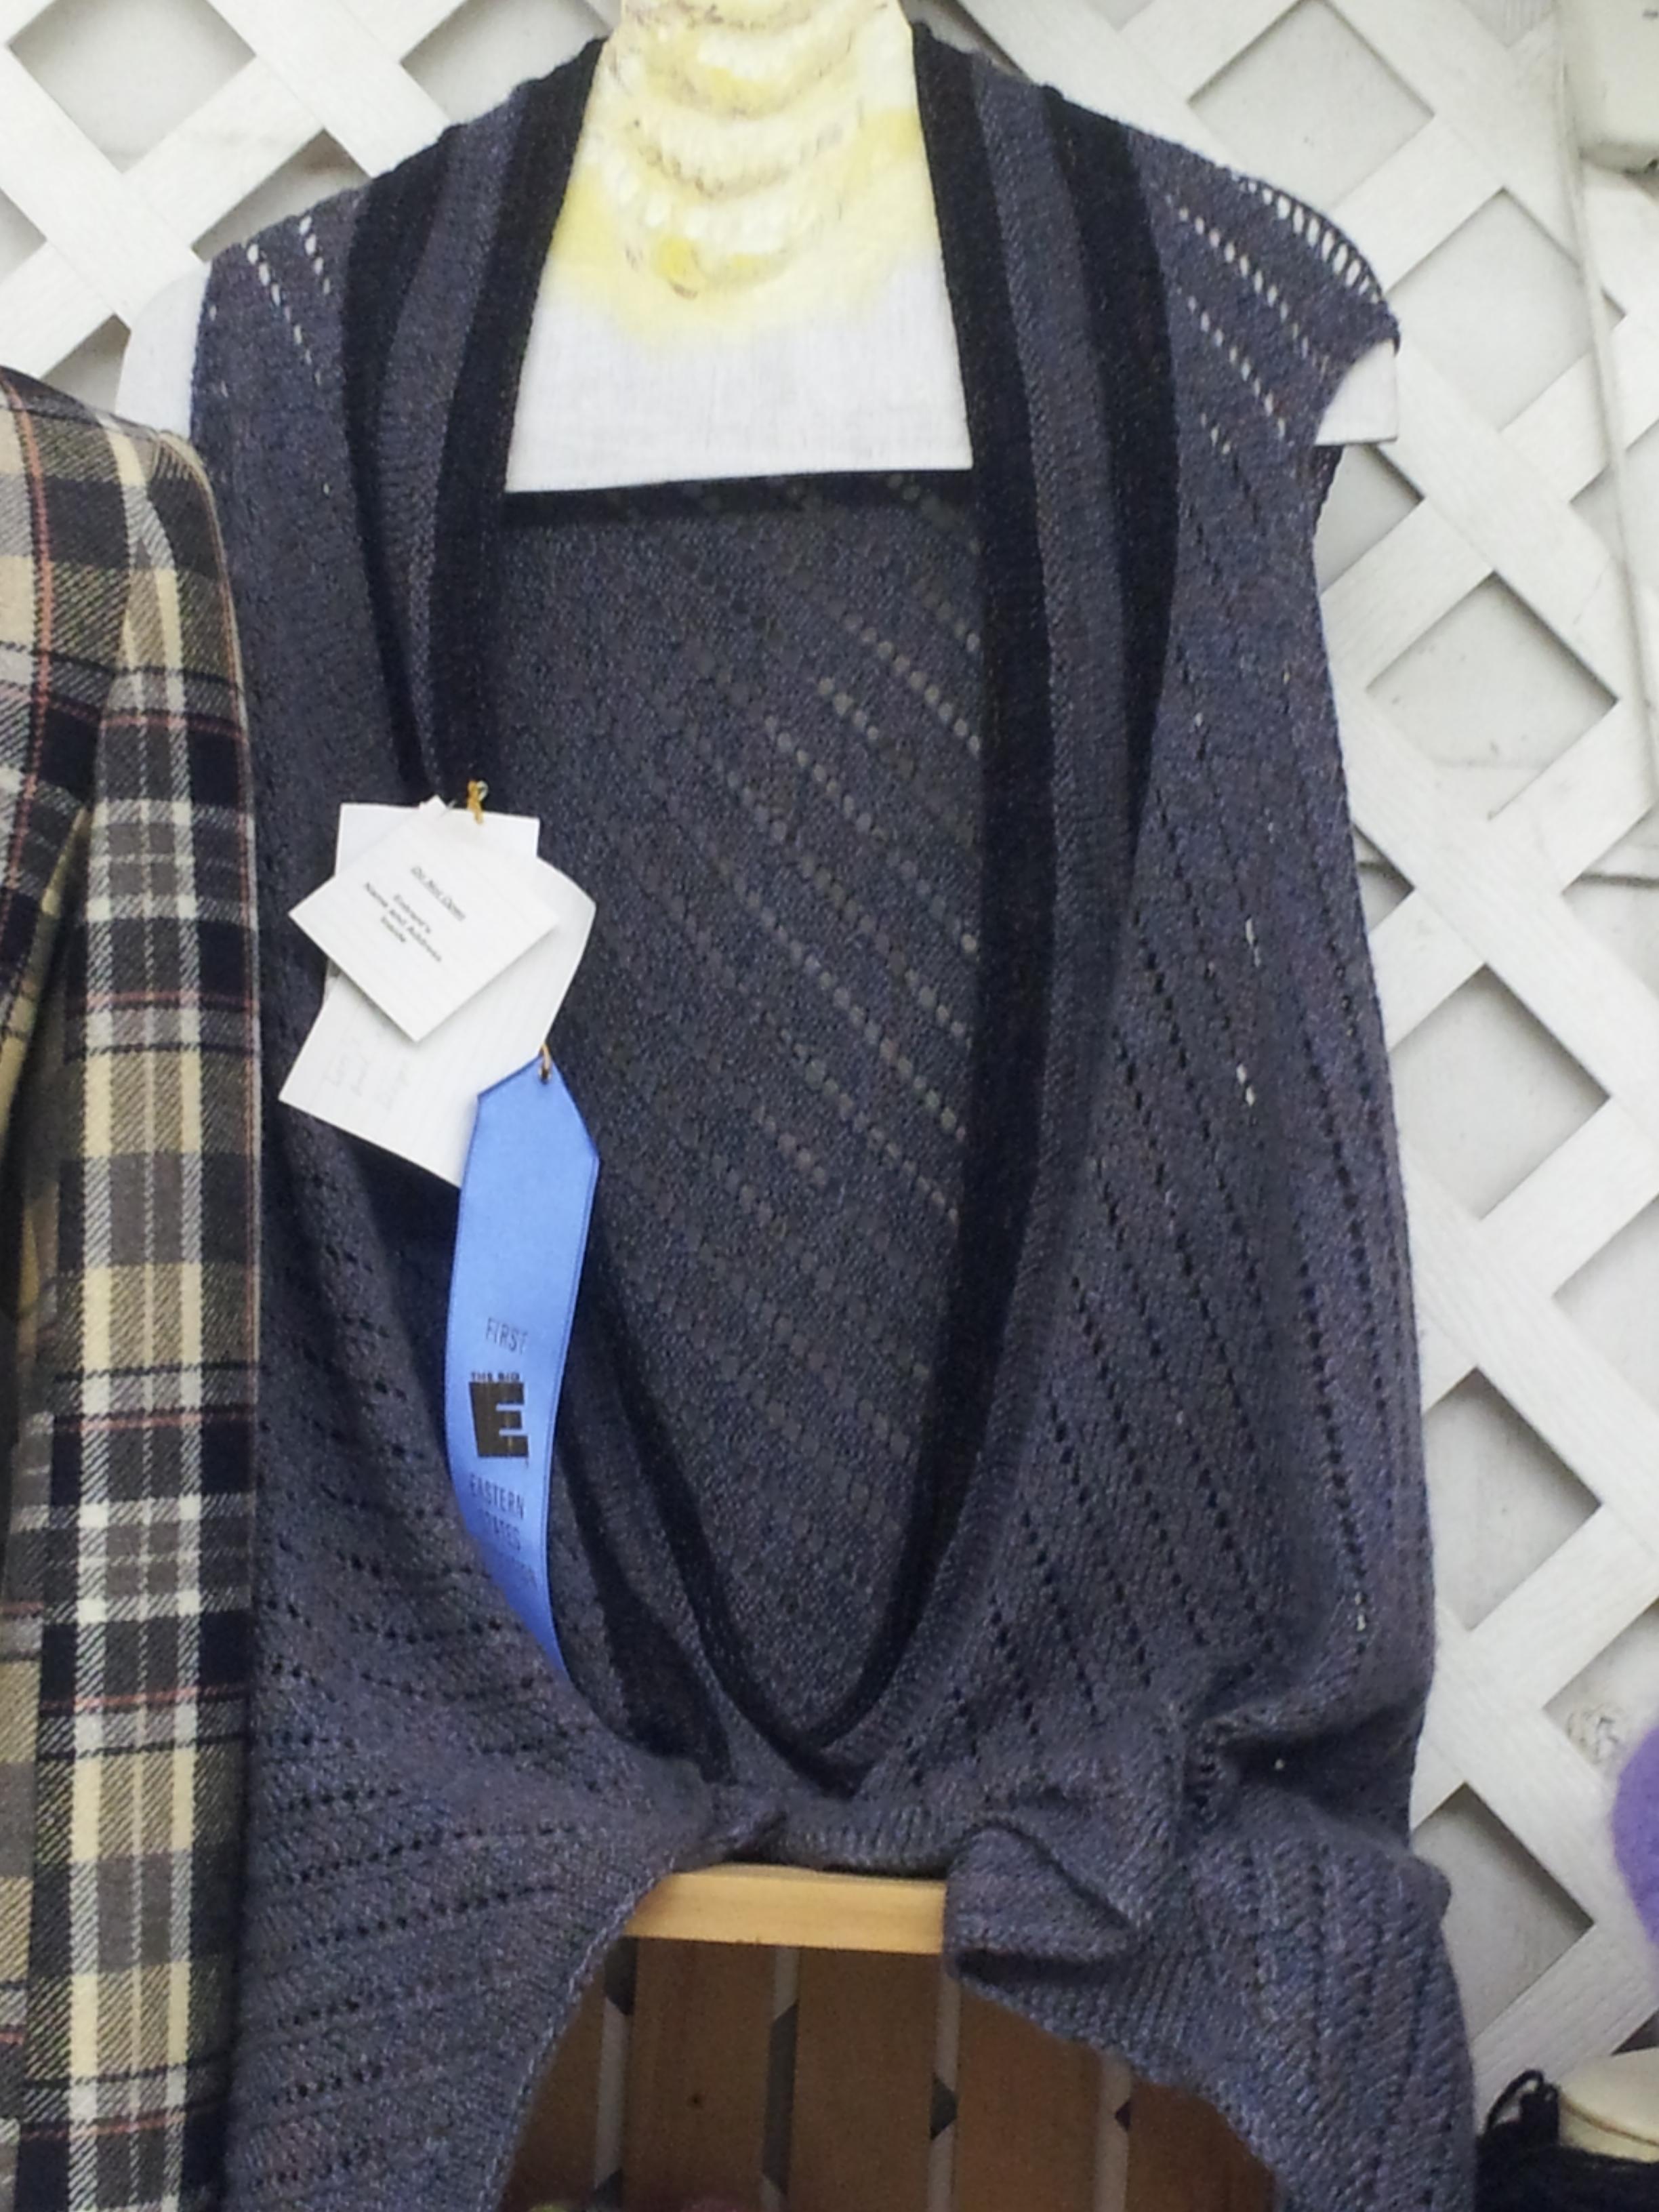 Beech Sweater/Vest